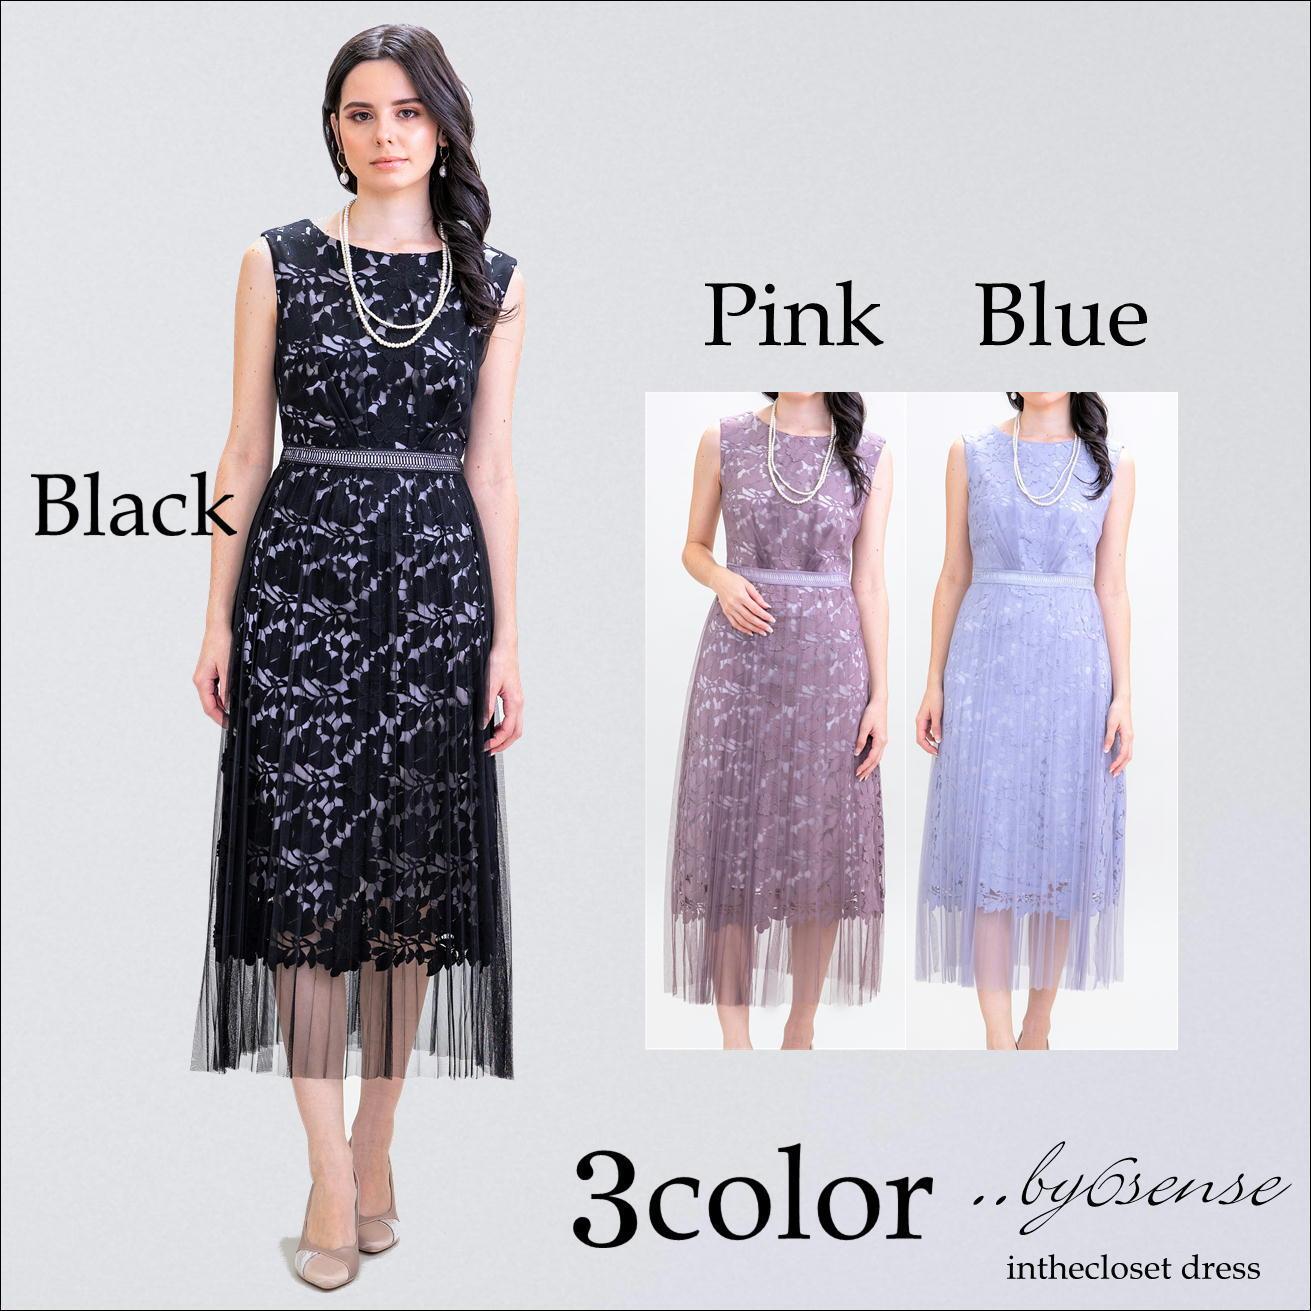 3colorチュールプリーツレース/ノースリーブドレス  結婚式・パーティードレス ..by6senseドレス